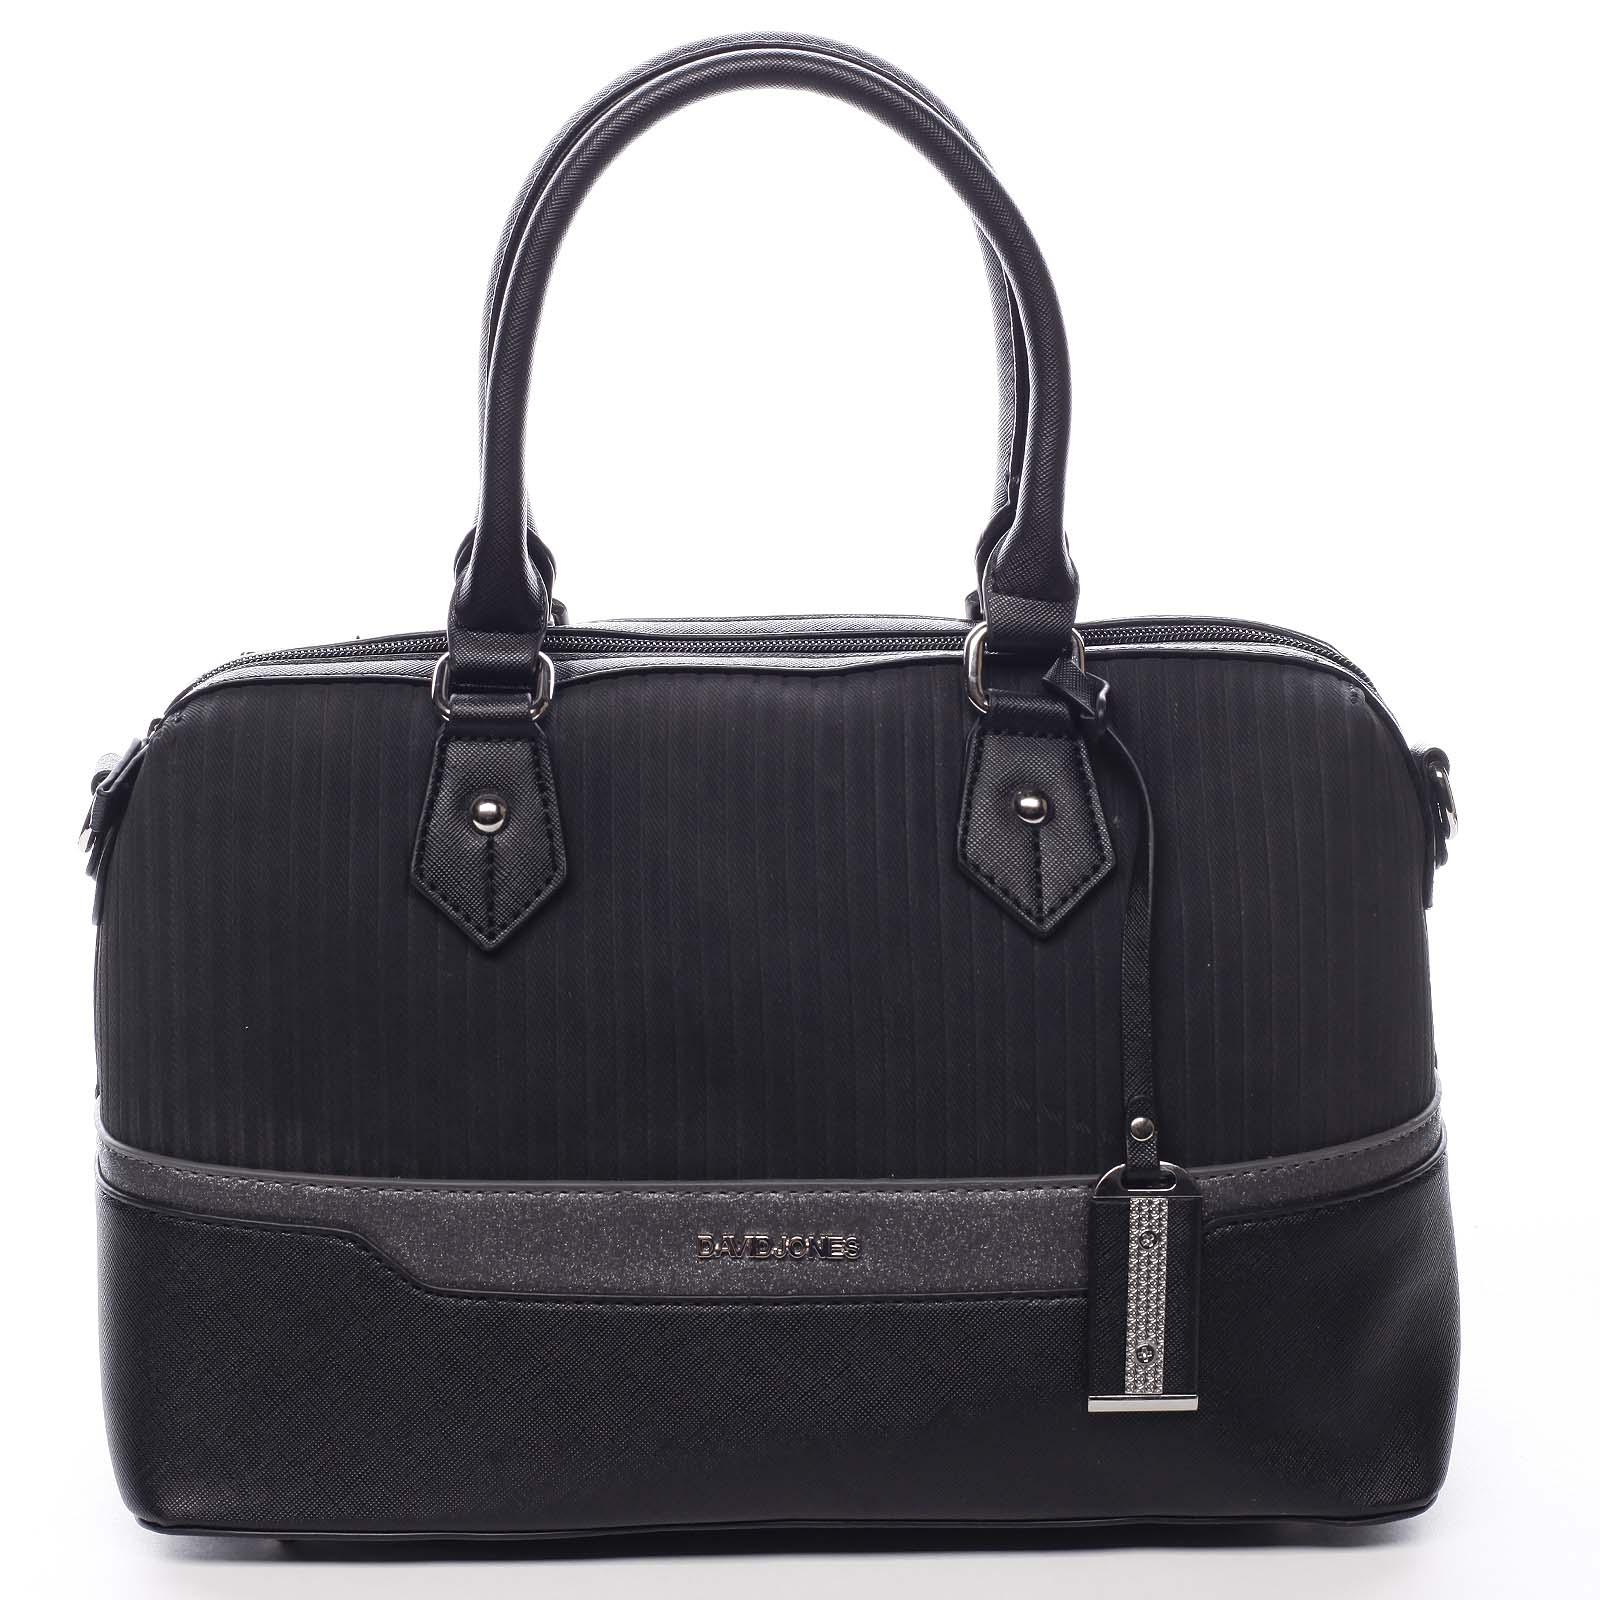 Dámska kabelka čierna - David Jones Maerless